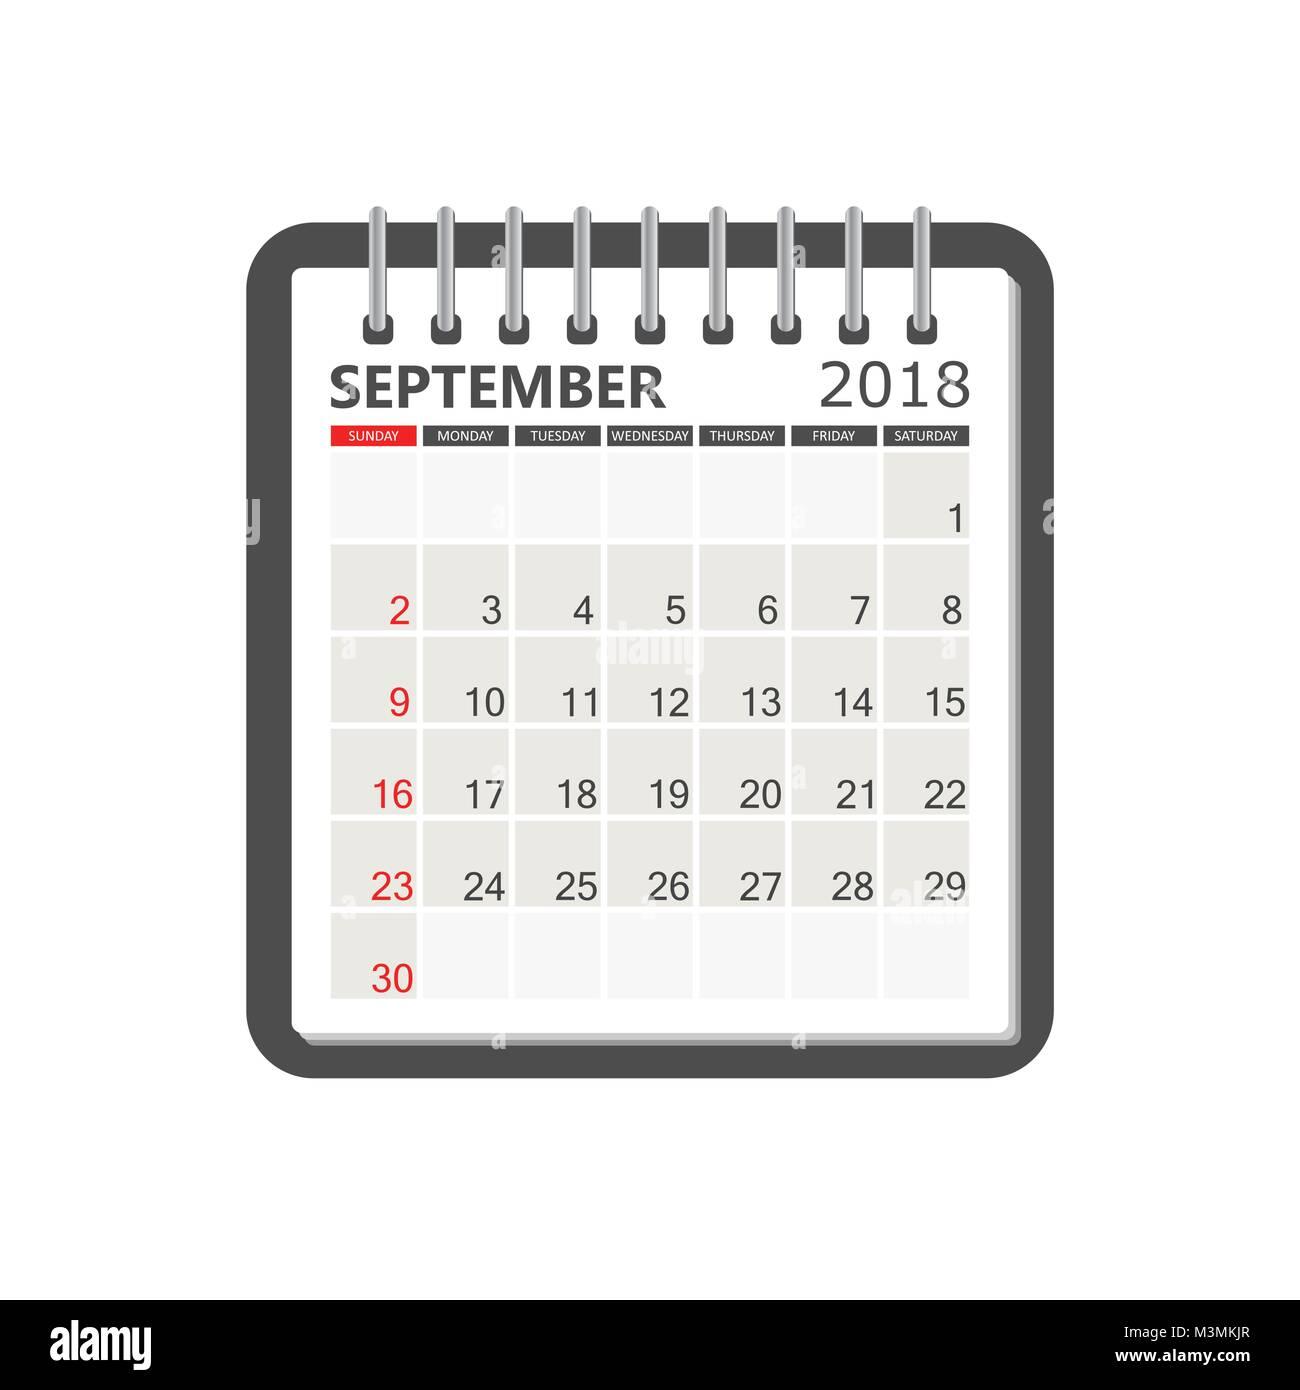 september 2018 calendar calendar notebook page template week starts on sunday business vector illustration